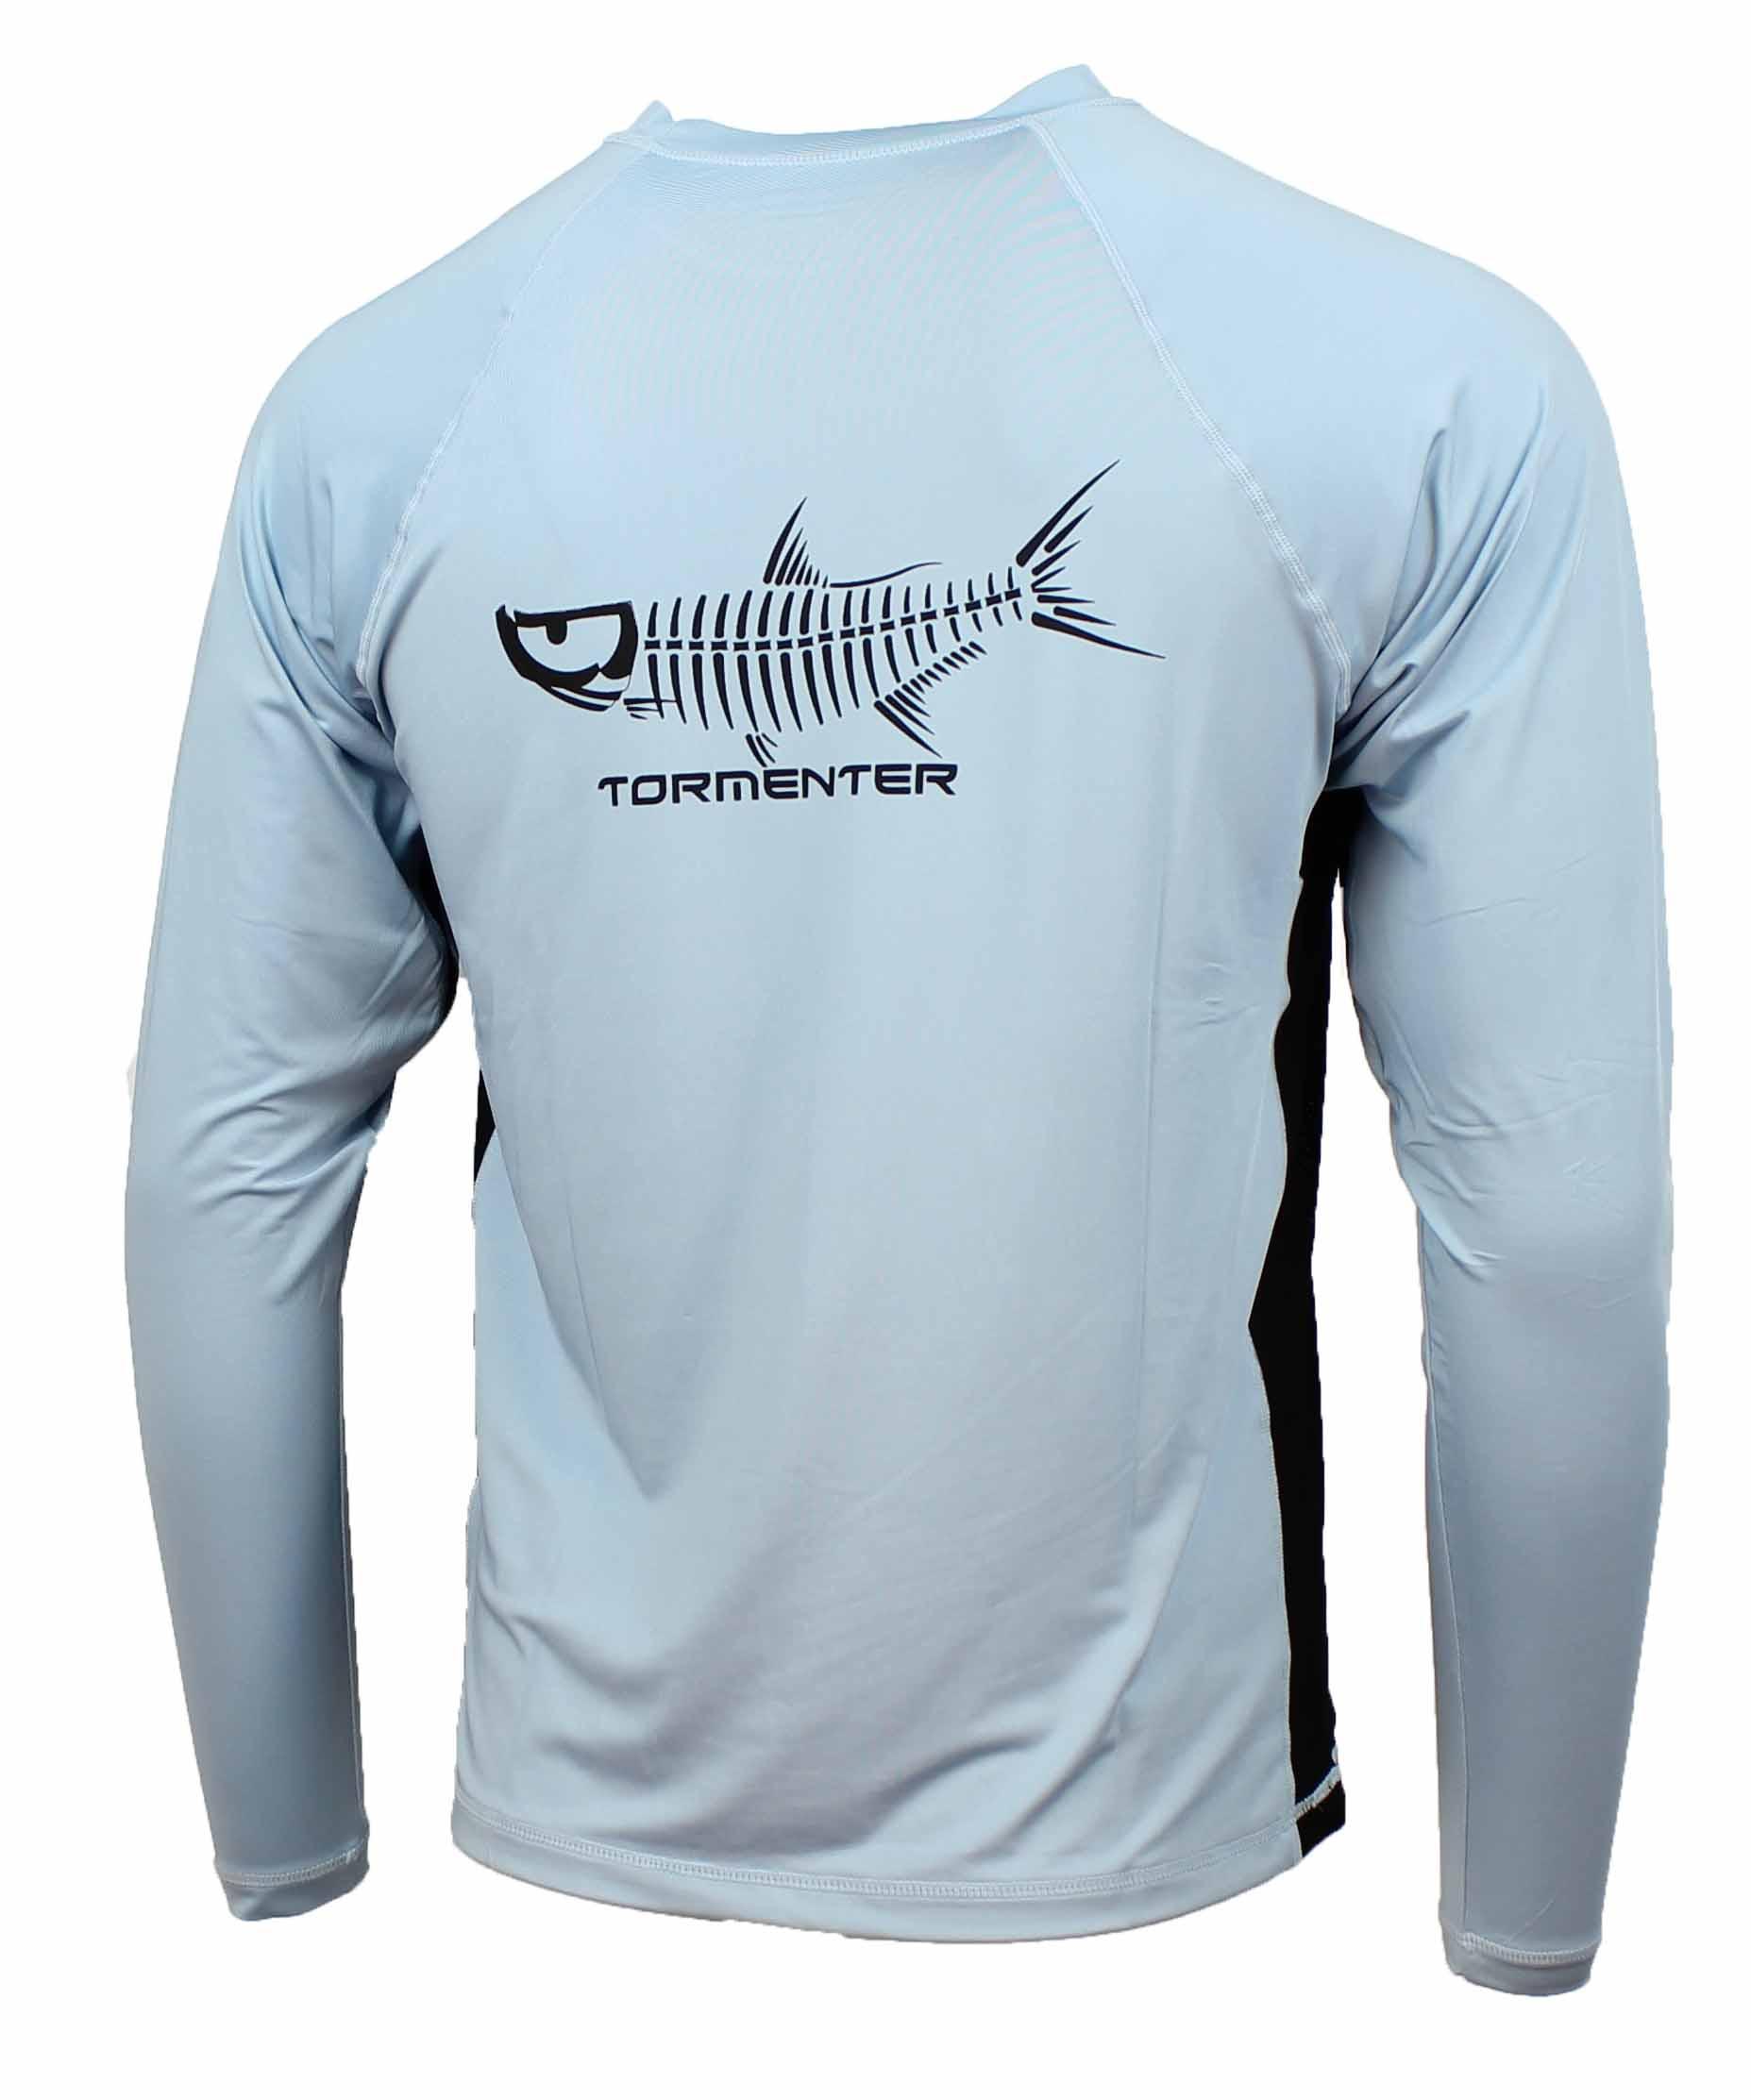 Tormenter Men's SPF-50 Long Sleeve Fishing Shirt